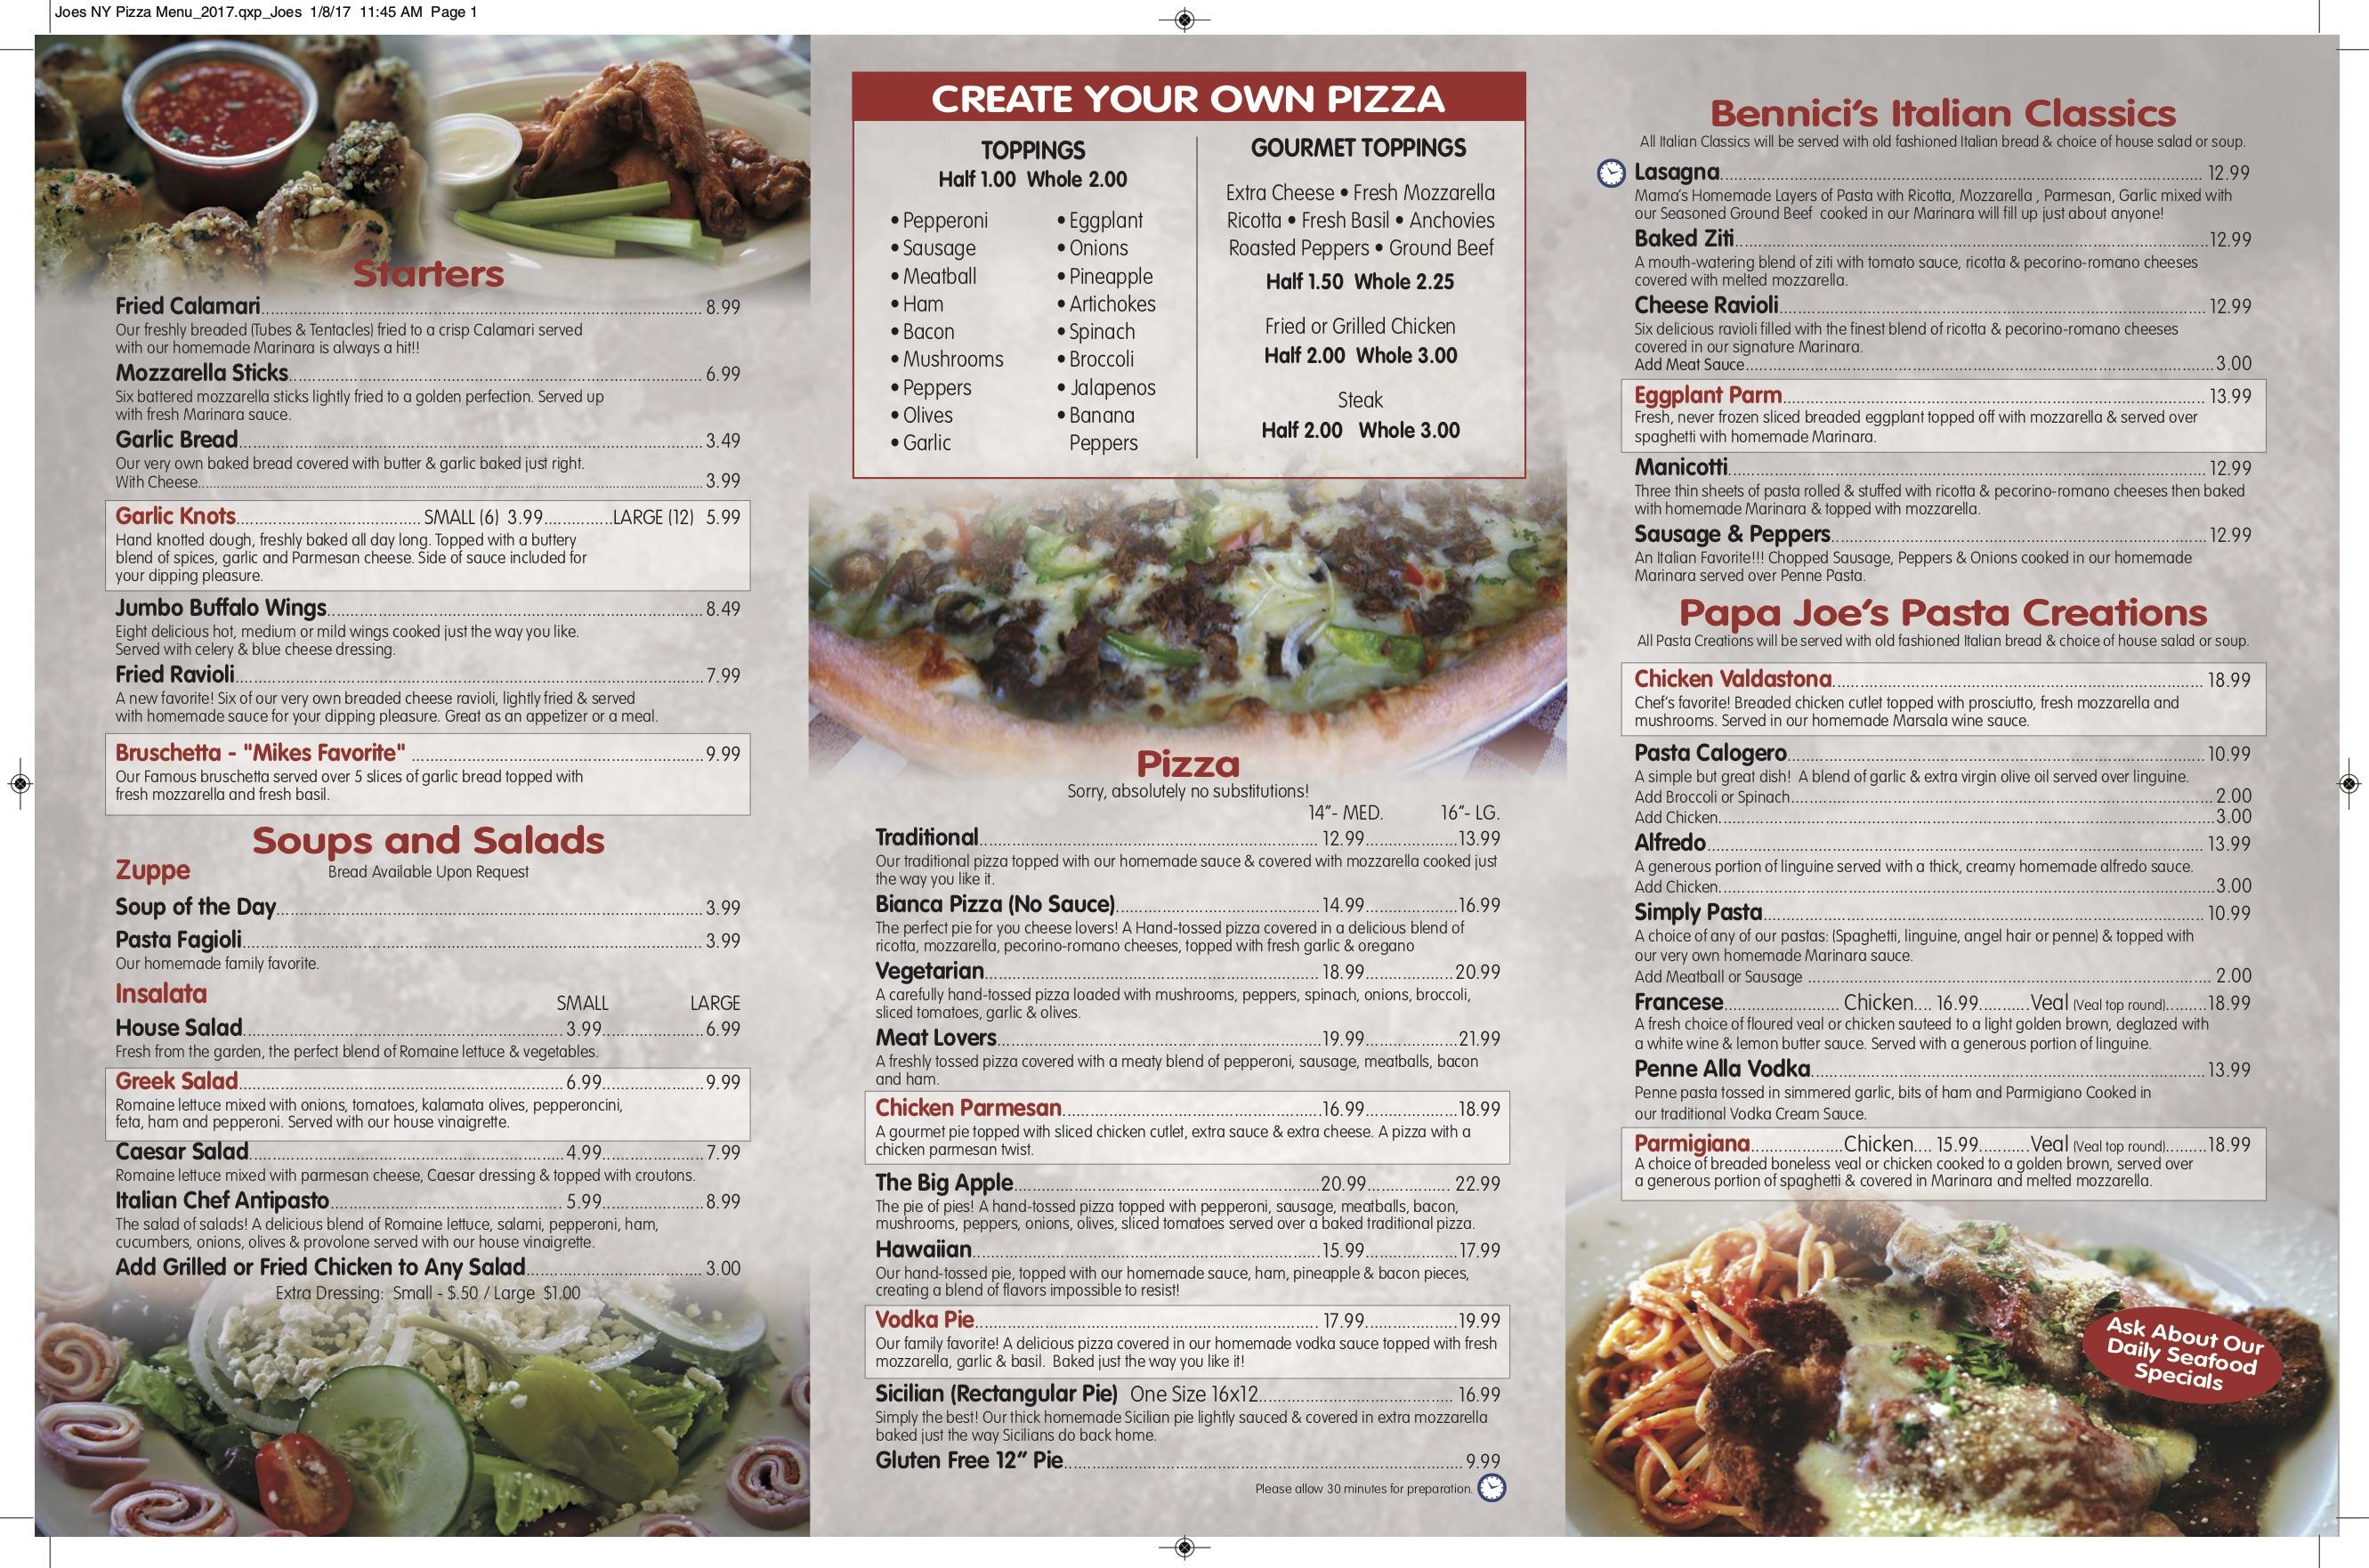 Z Pizza Mammoth Menu Joe's New York Pizza &...